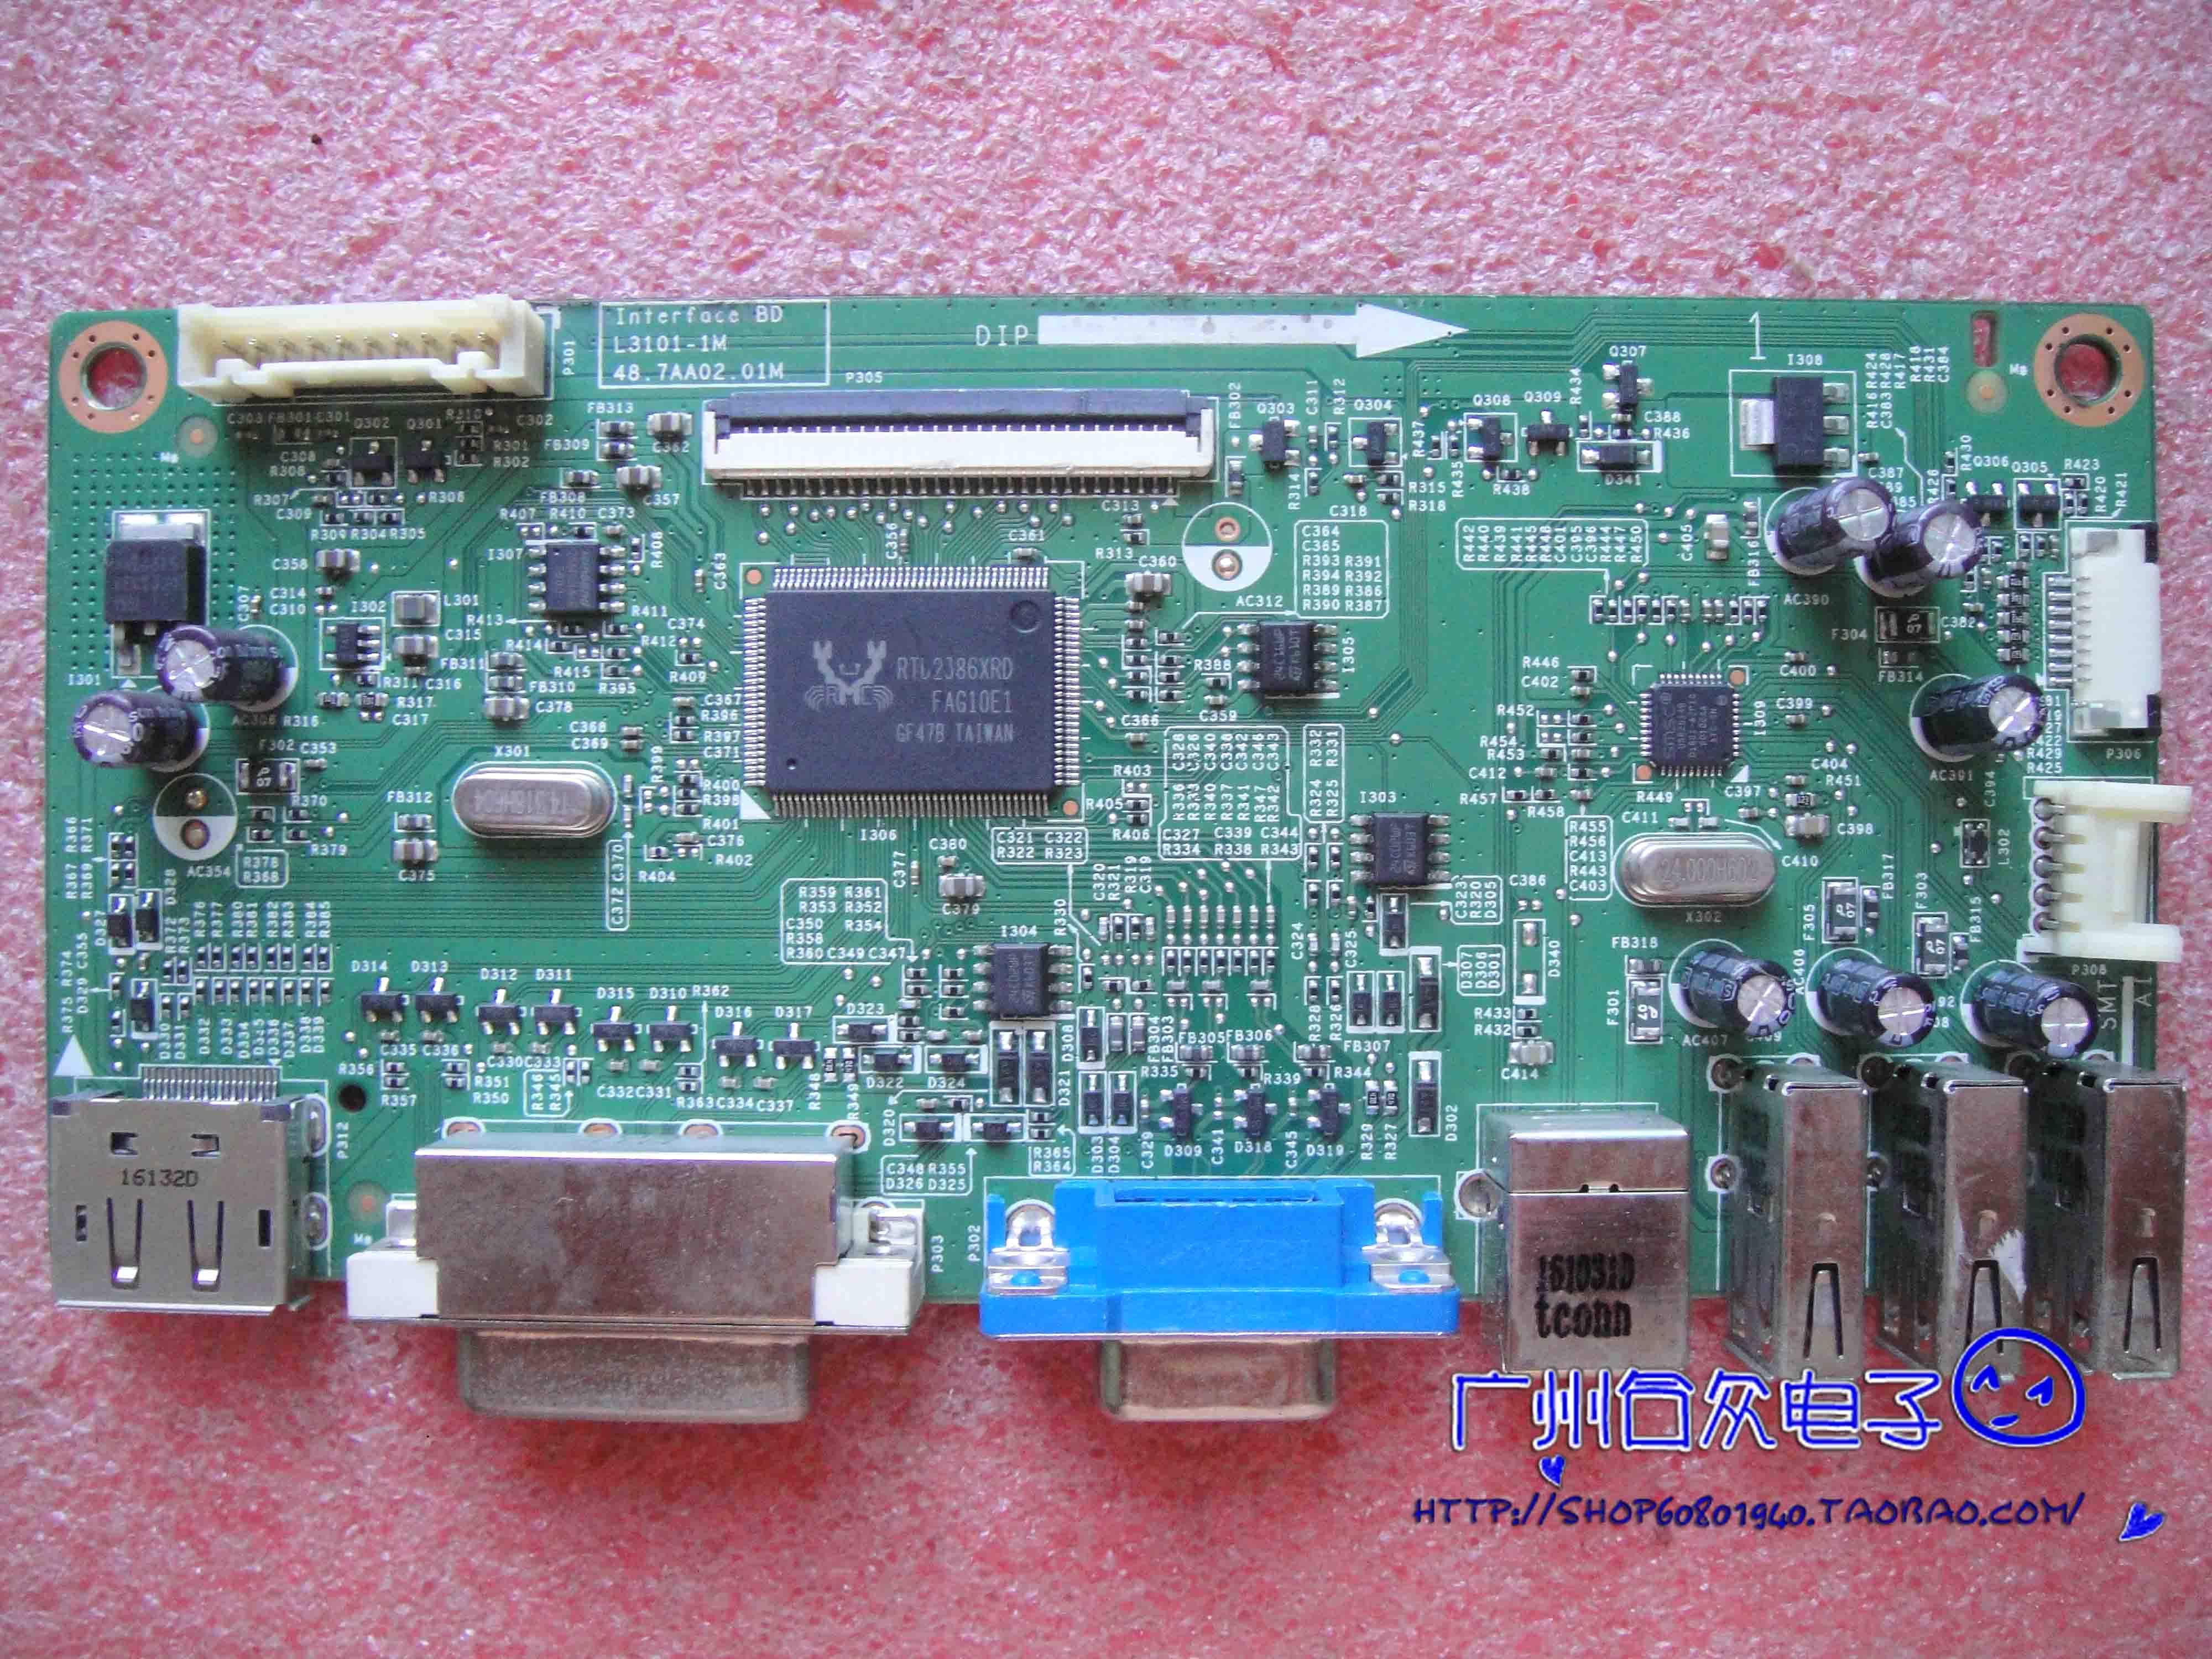 ديل P2314Ht L3101-1M 48.7AA02.01M مدفوعة لوحة شاشة HR230WU1-400